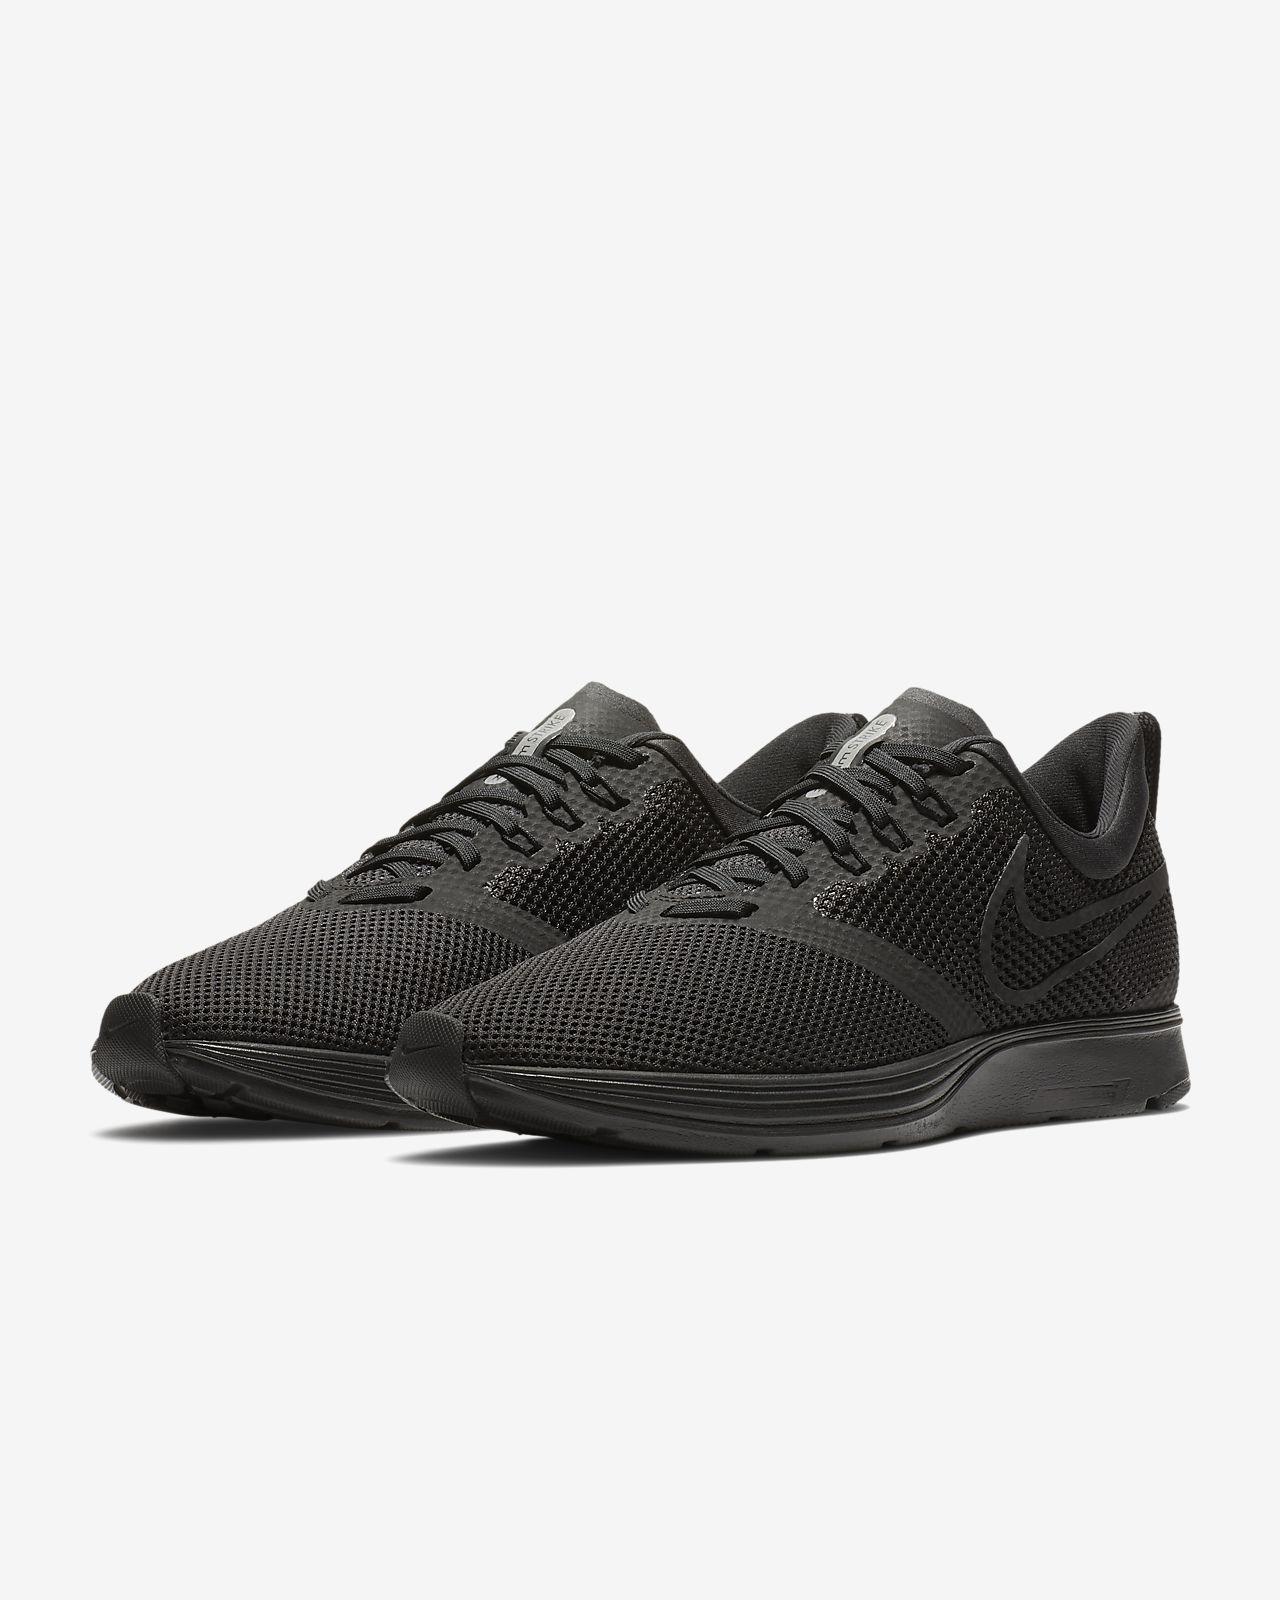 343c7e6c30dd ... nike zoom strike mens running shoe